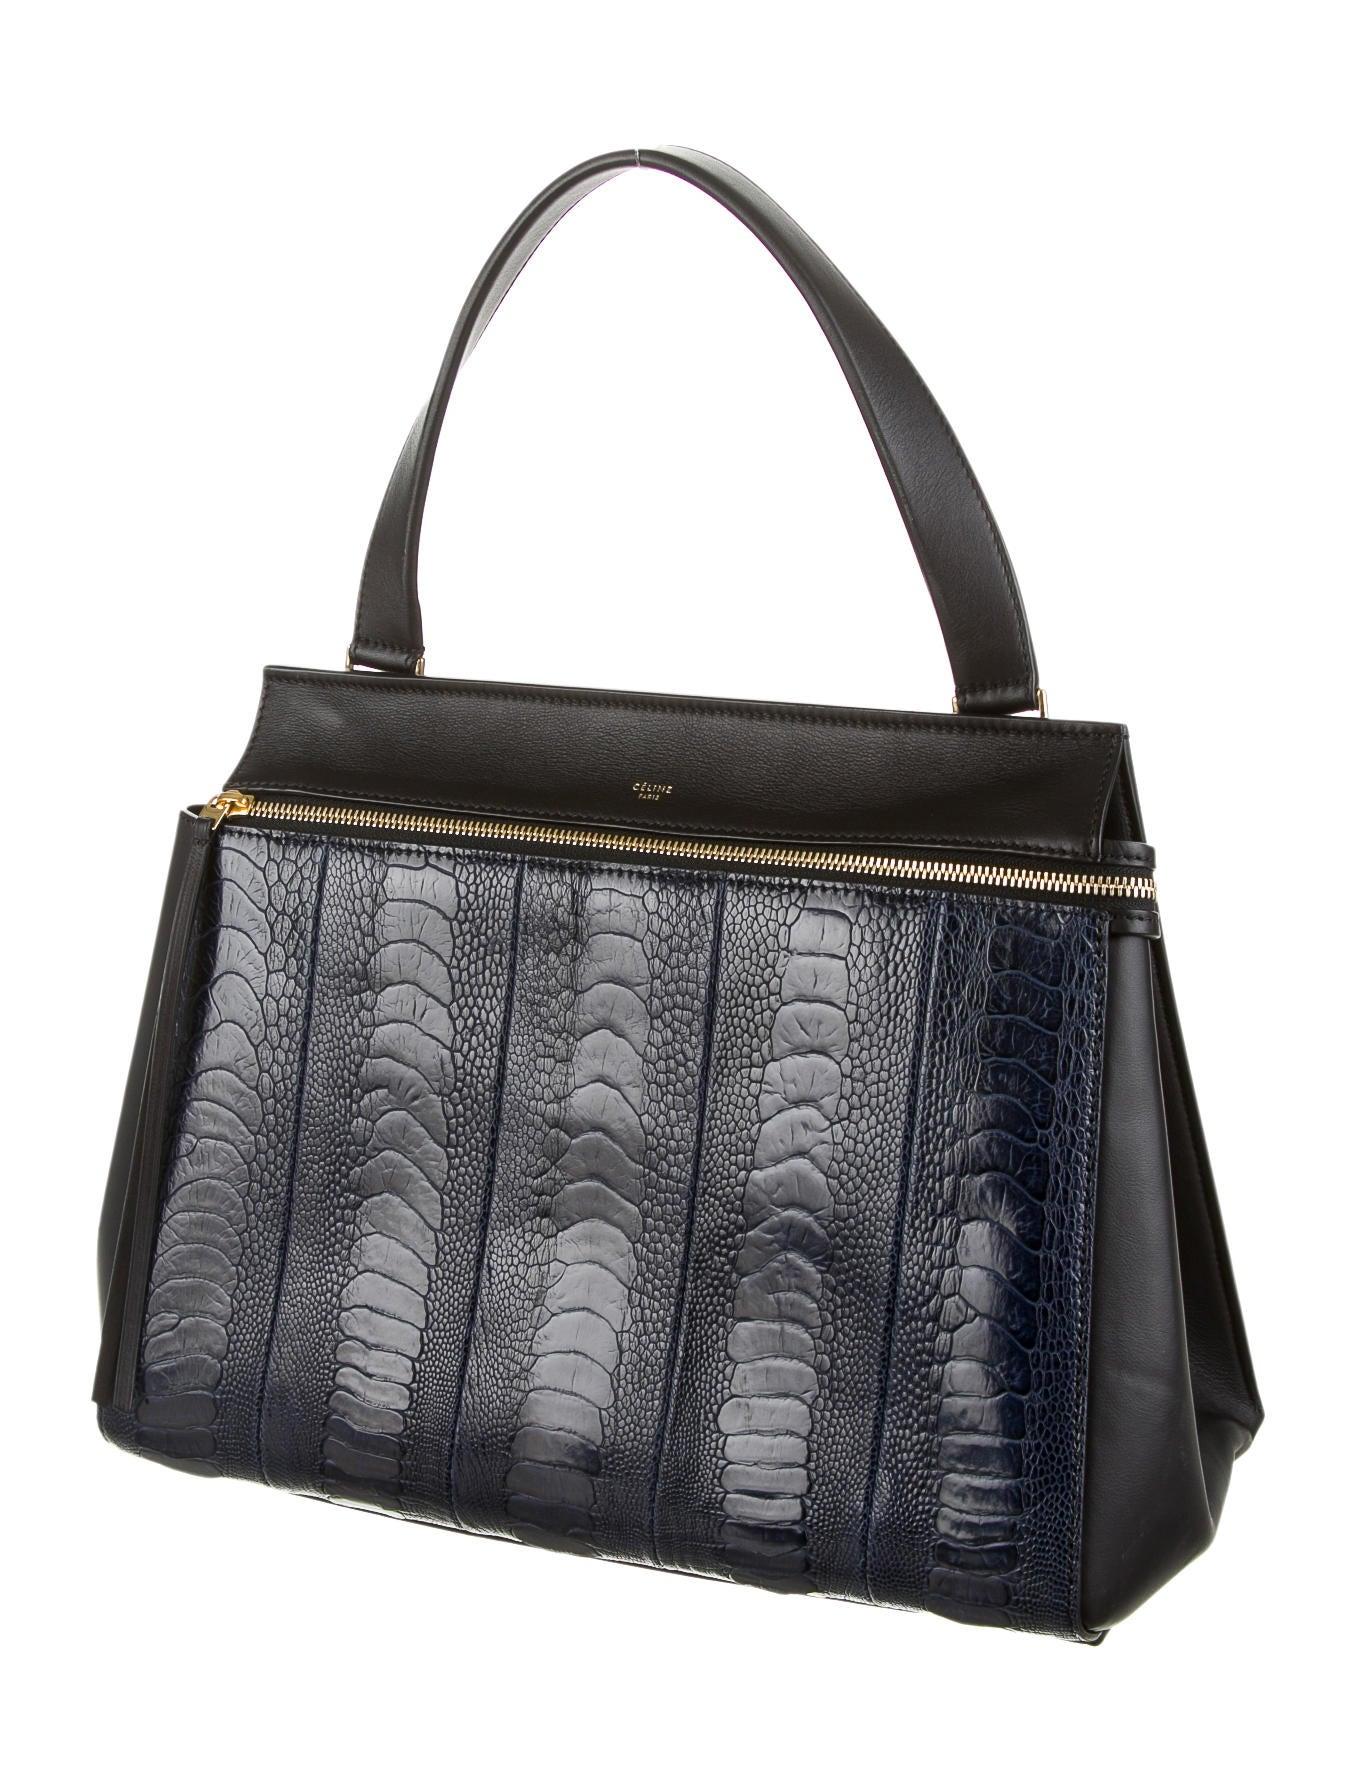 Celine Women S Handbags Jaguar Clubs Of North America